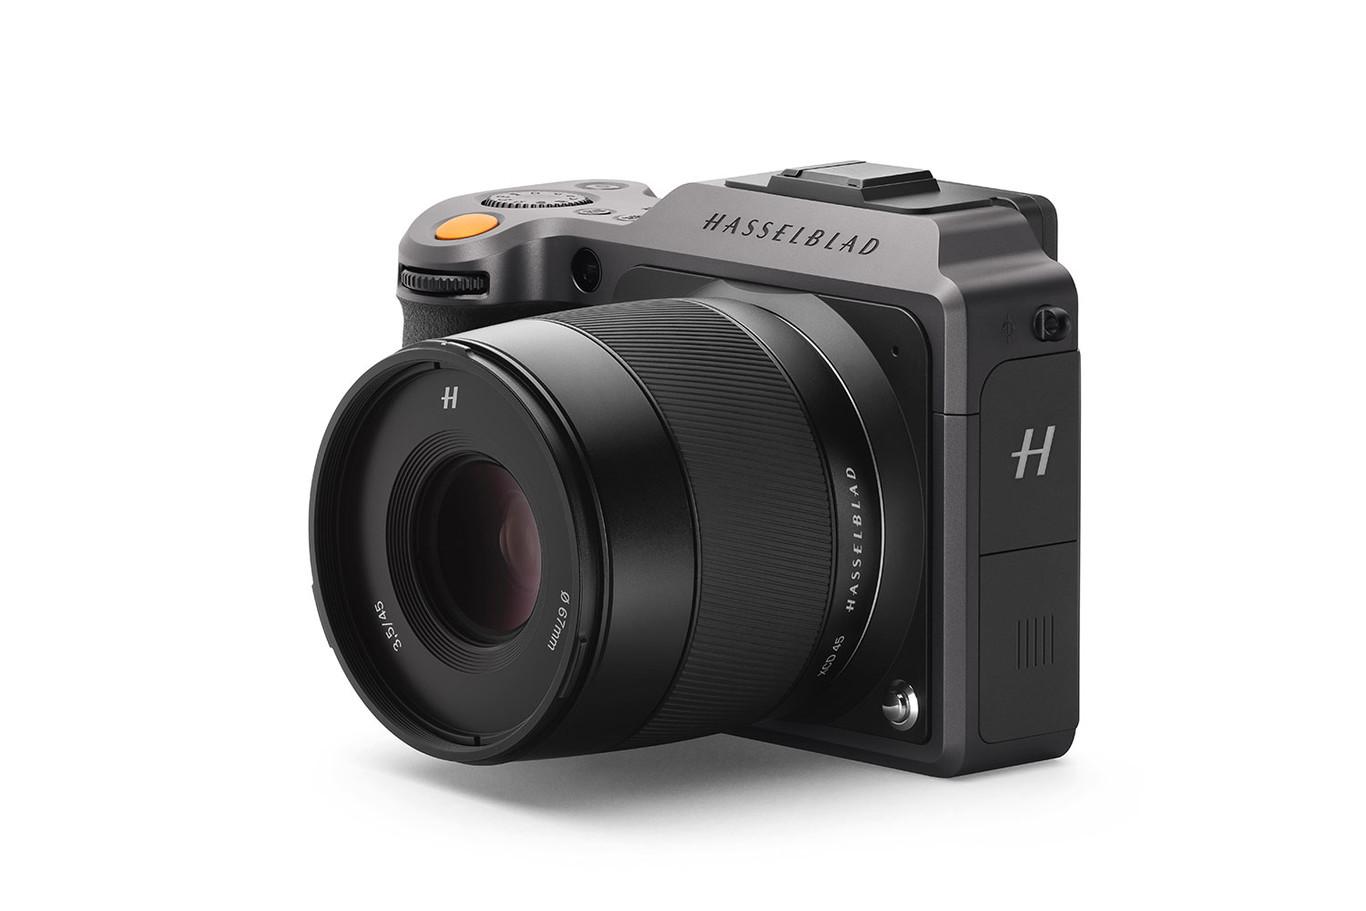 Hasselblad presenta la nueva mirrorless X1D II 50c, respaldo CVF II 50C, cuerpo 907X y objetivo XCD 3.5-4.5 / 35-75 Zoom